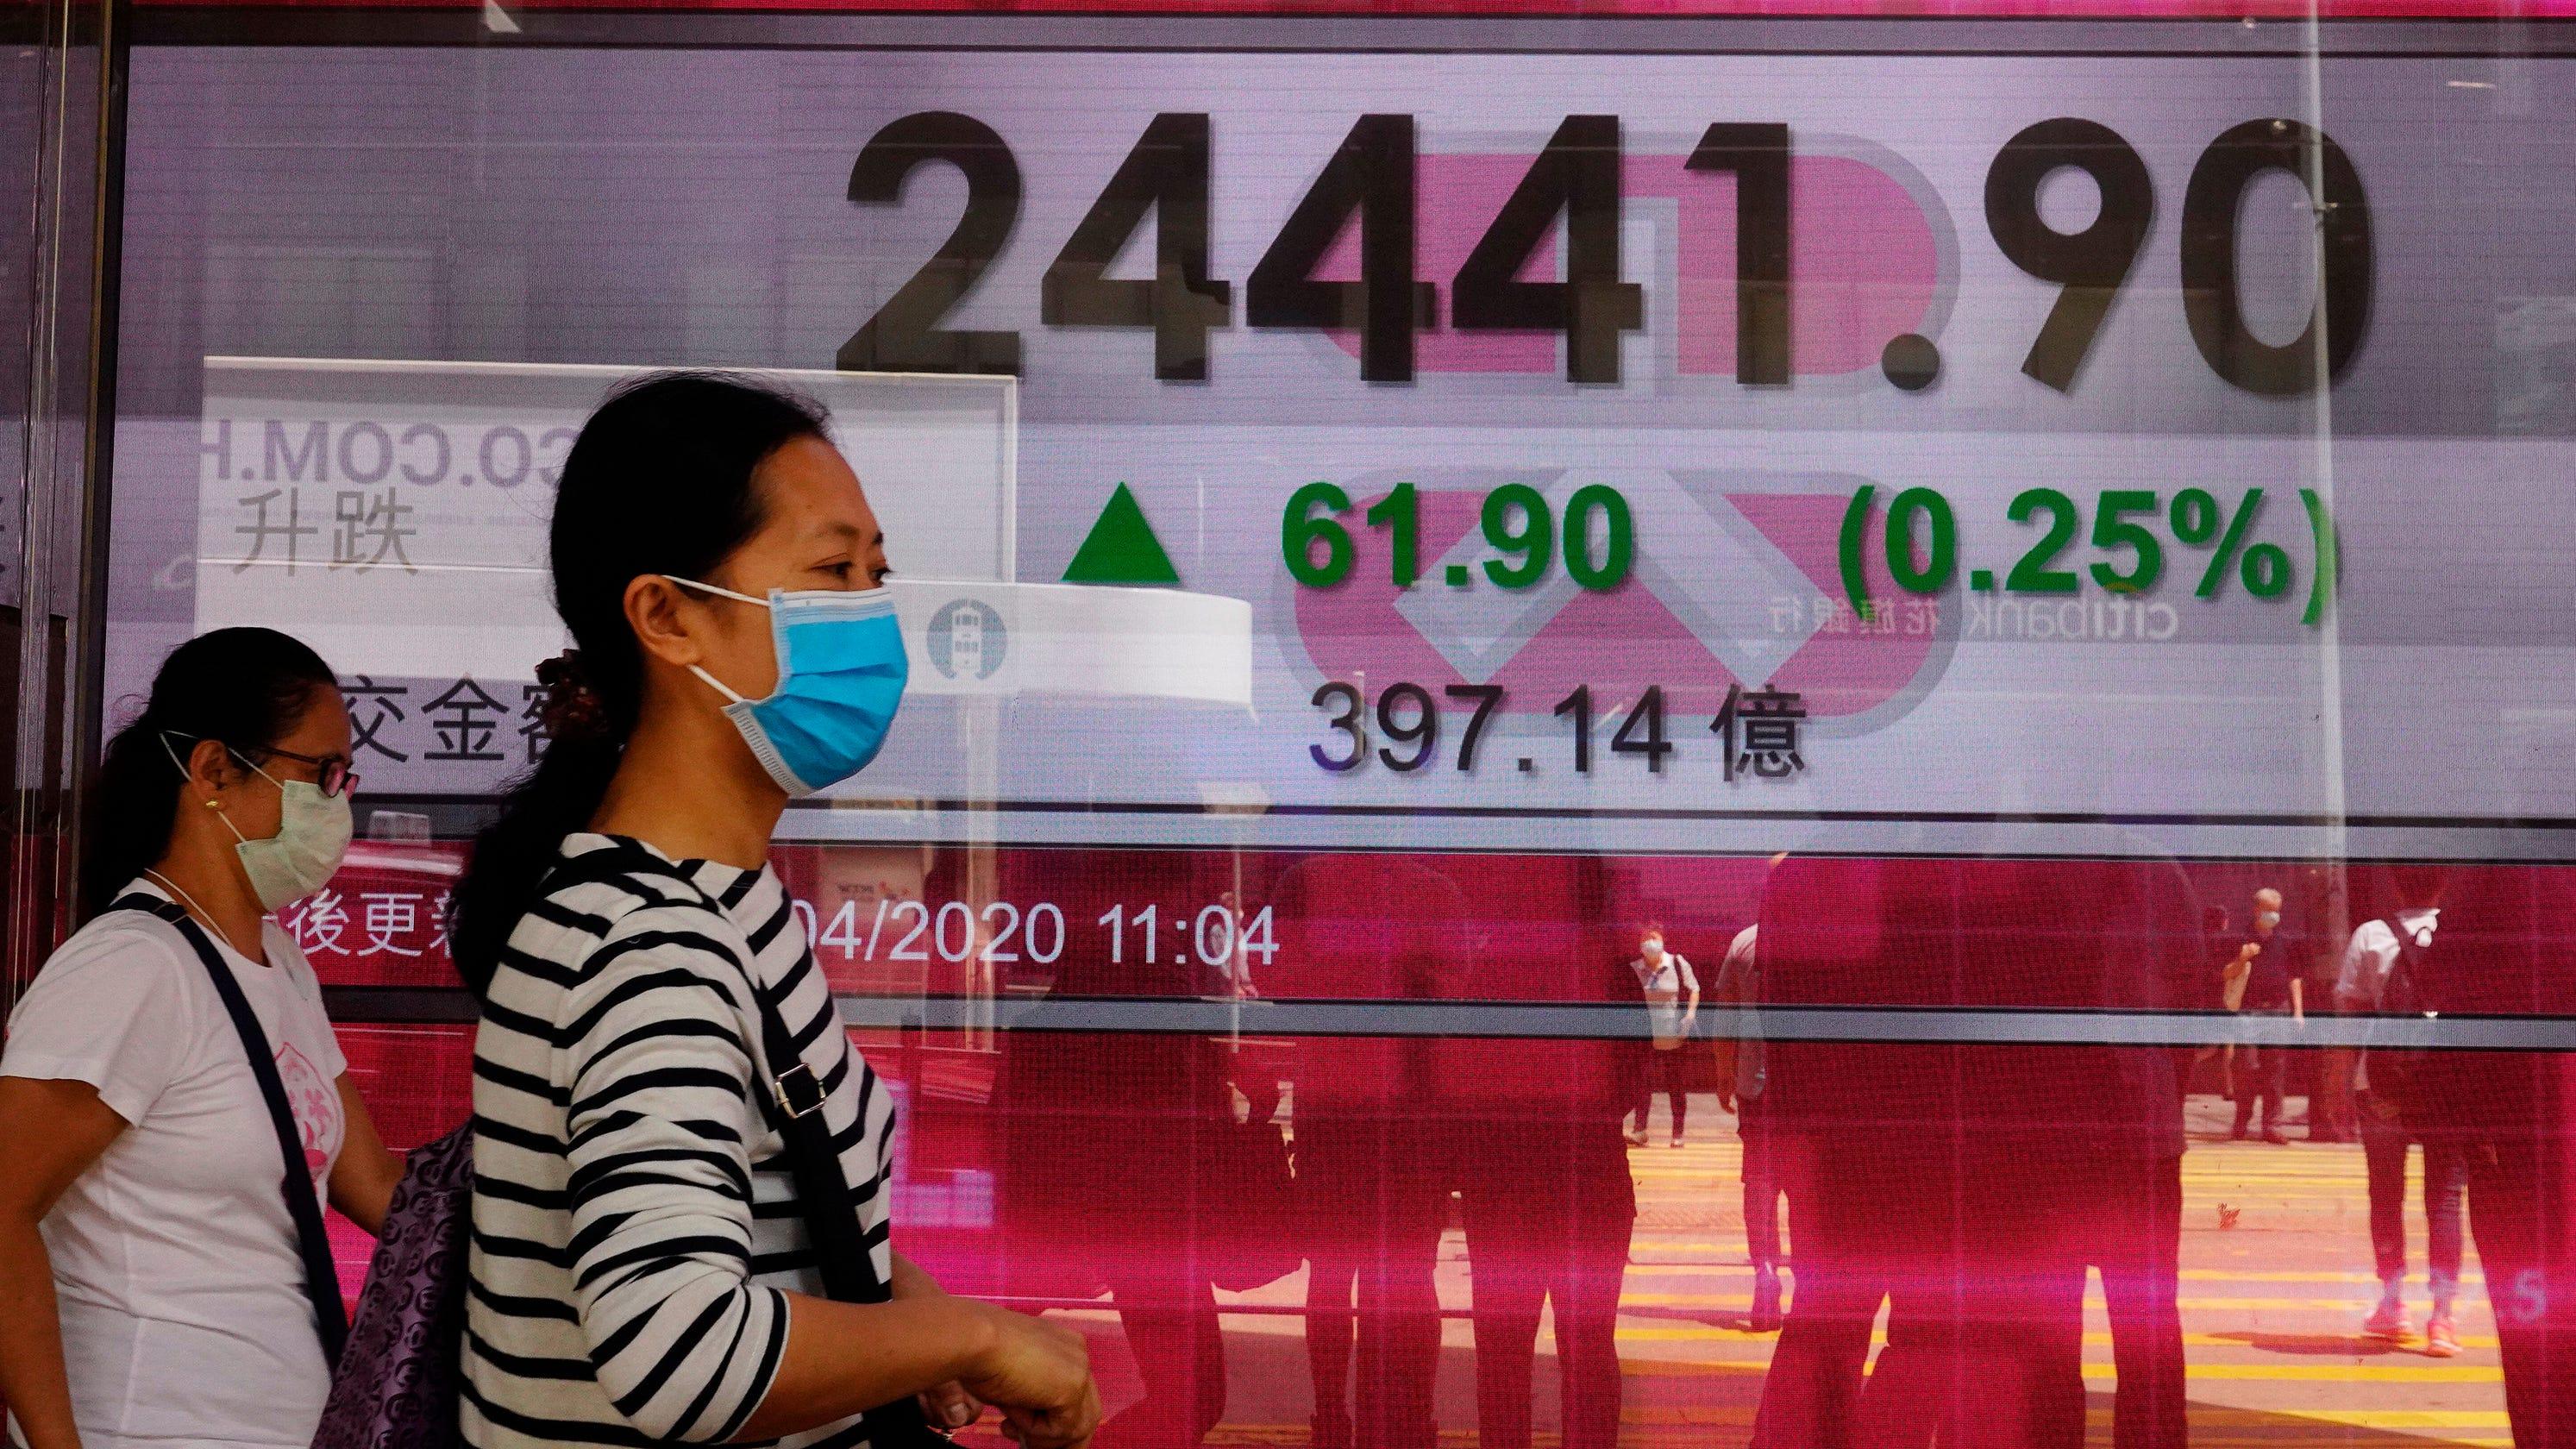 Oil prices drop below zero, sending Dow, stocks lower